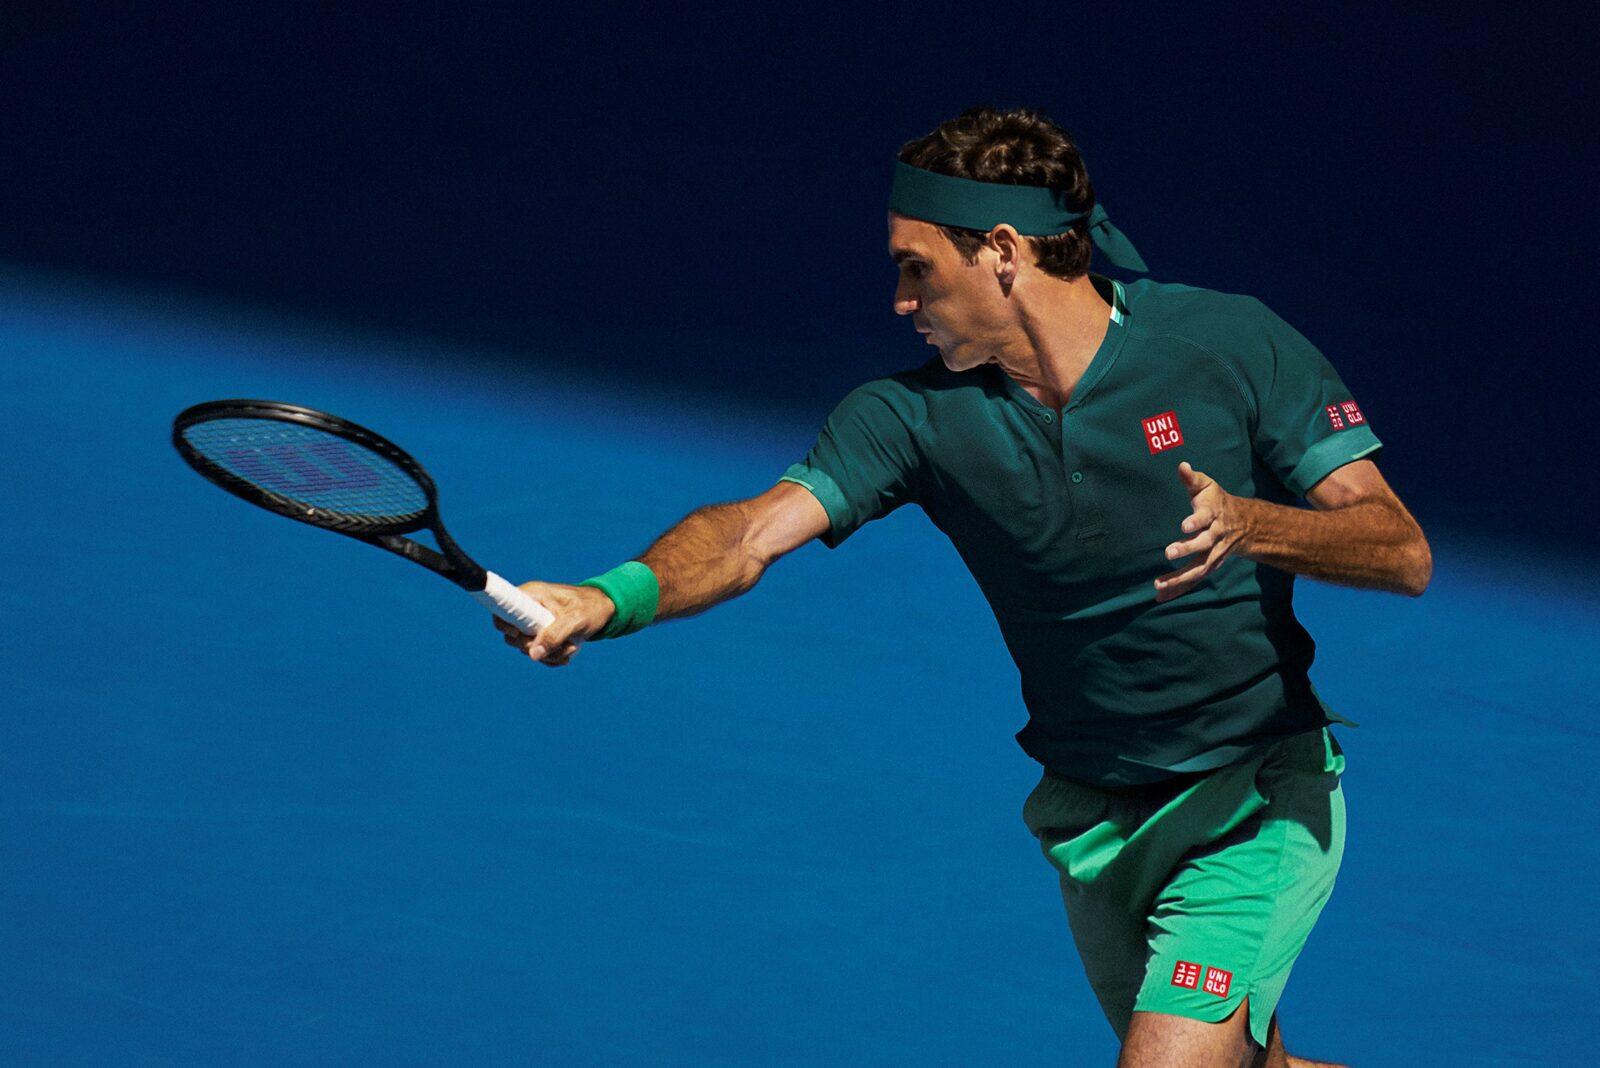 Roger Federer x UNIQLO